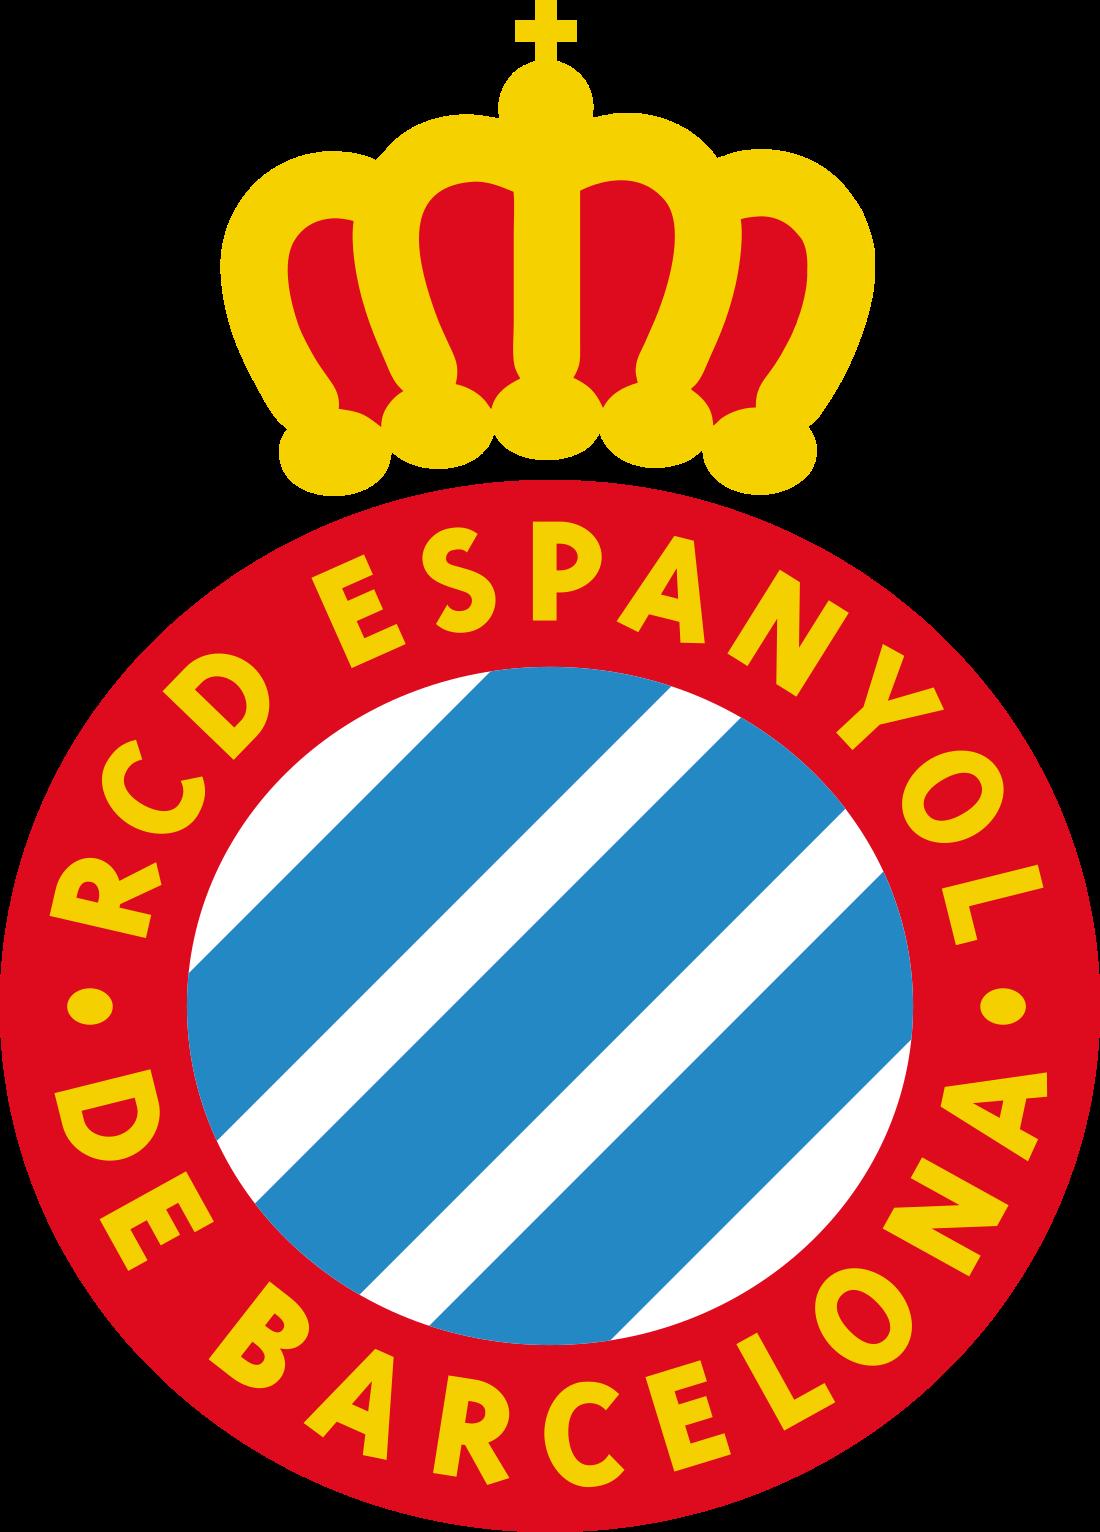 rcd-espanyol-logo-escudo-3